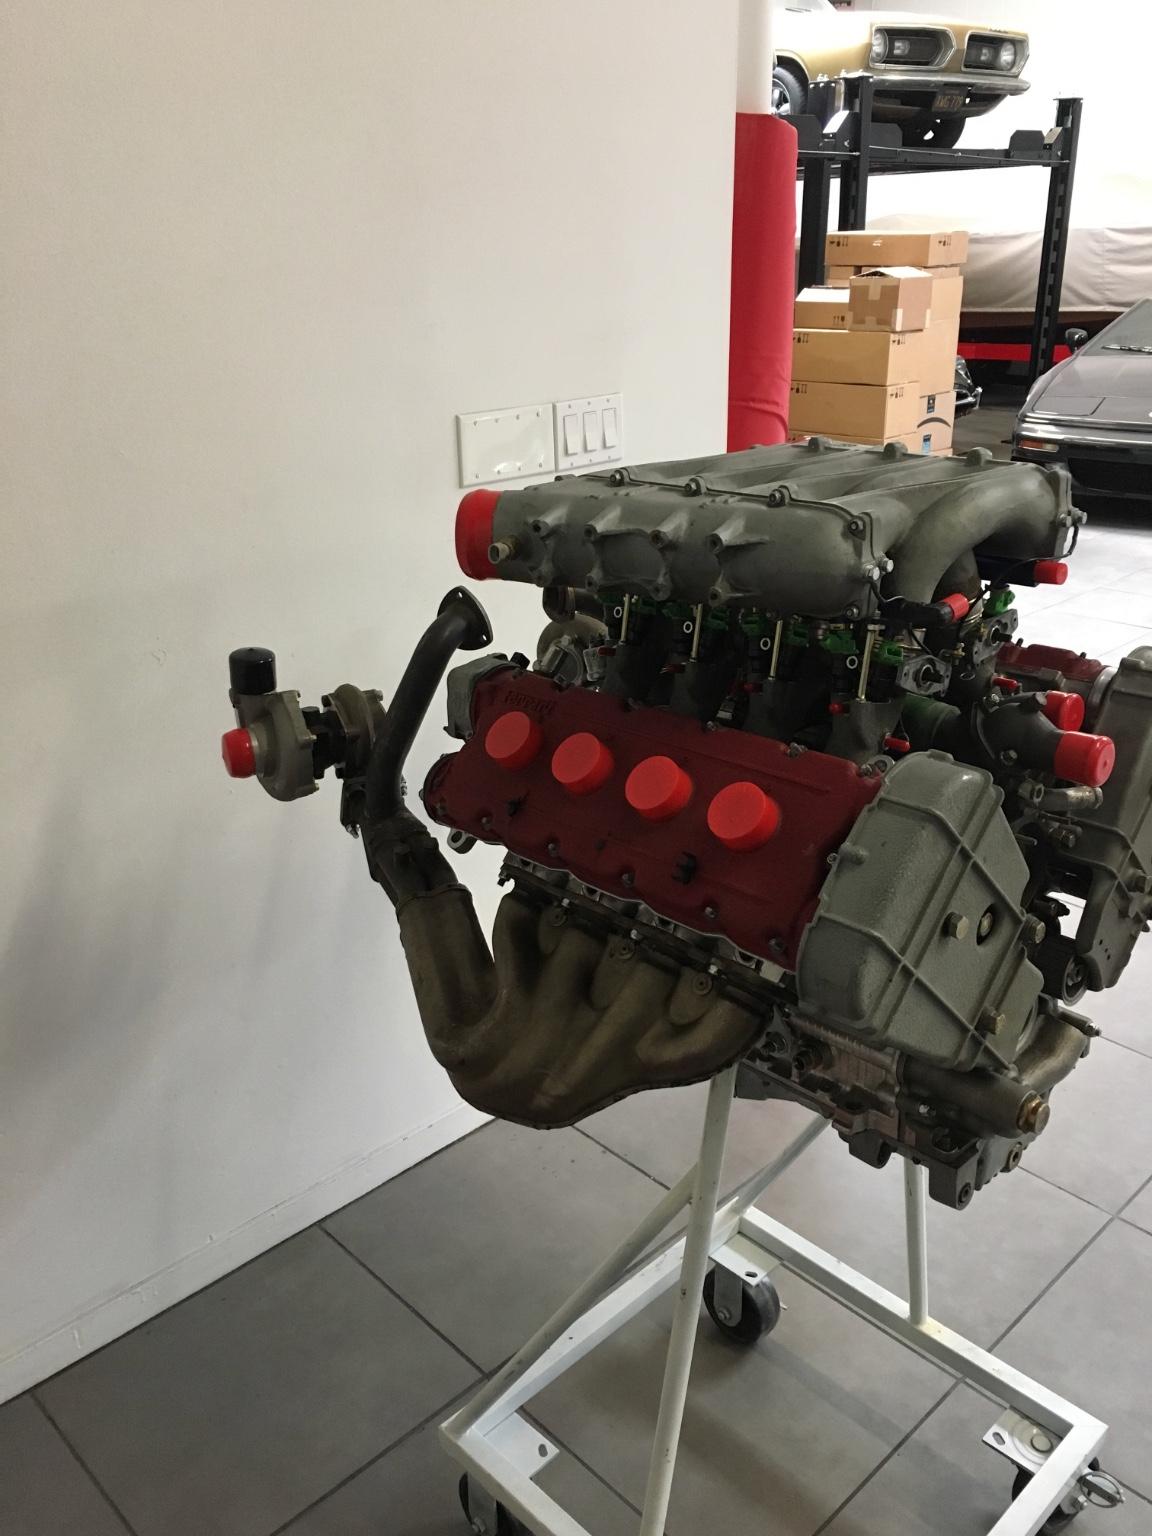 Ferrari F40 engine for sale (33)